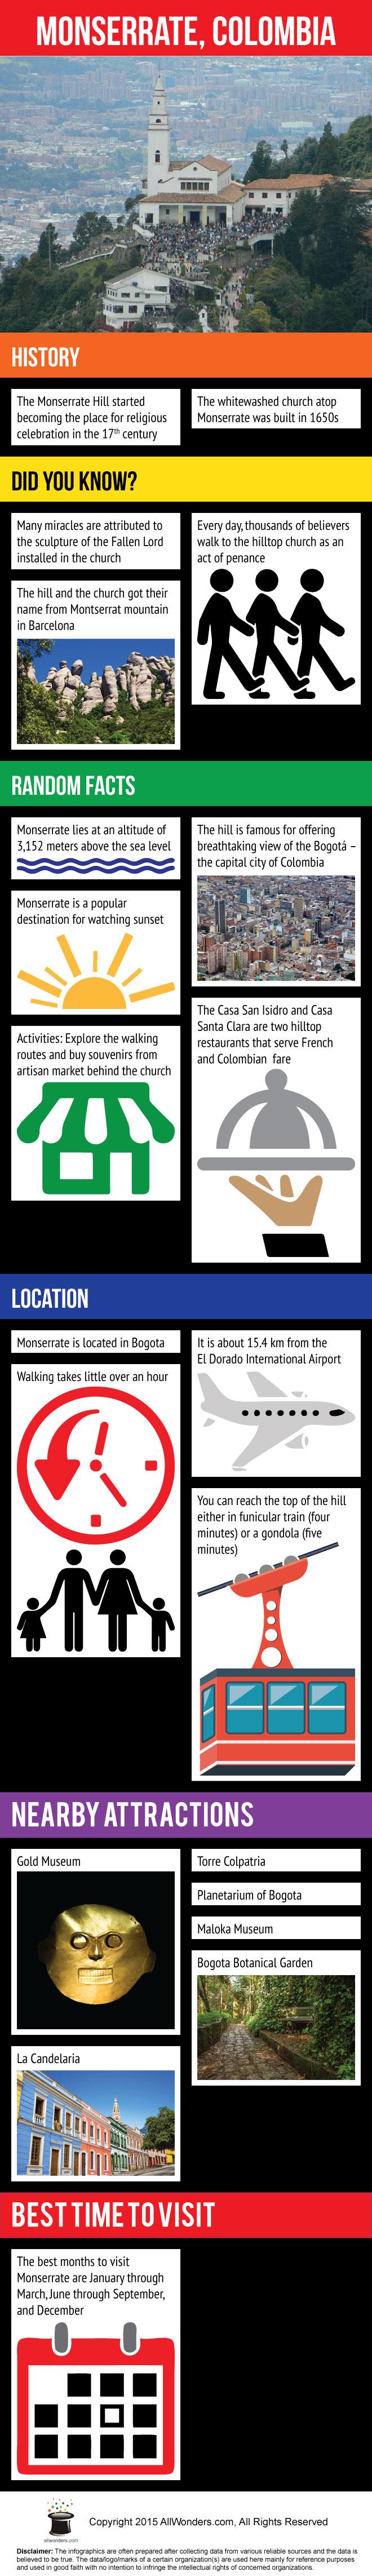 Monserrate Infographic